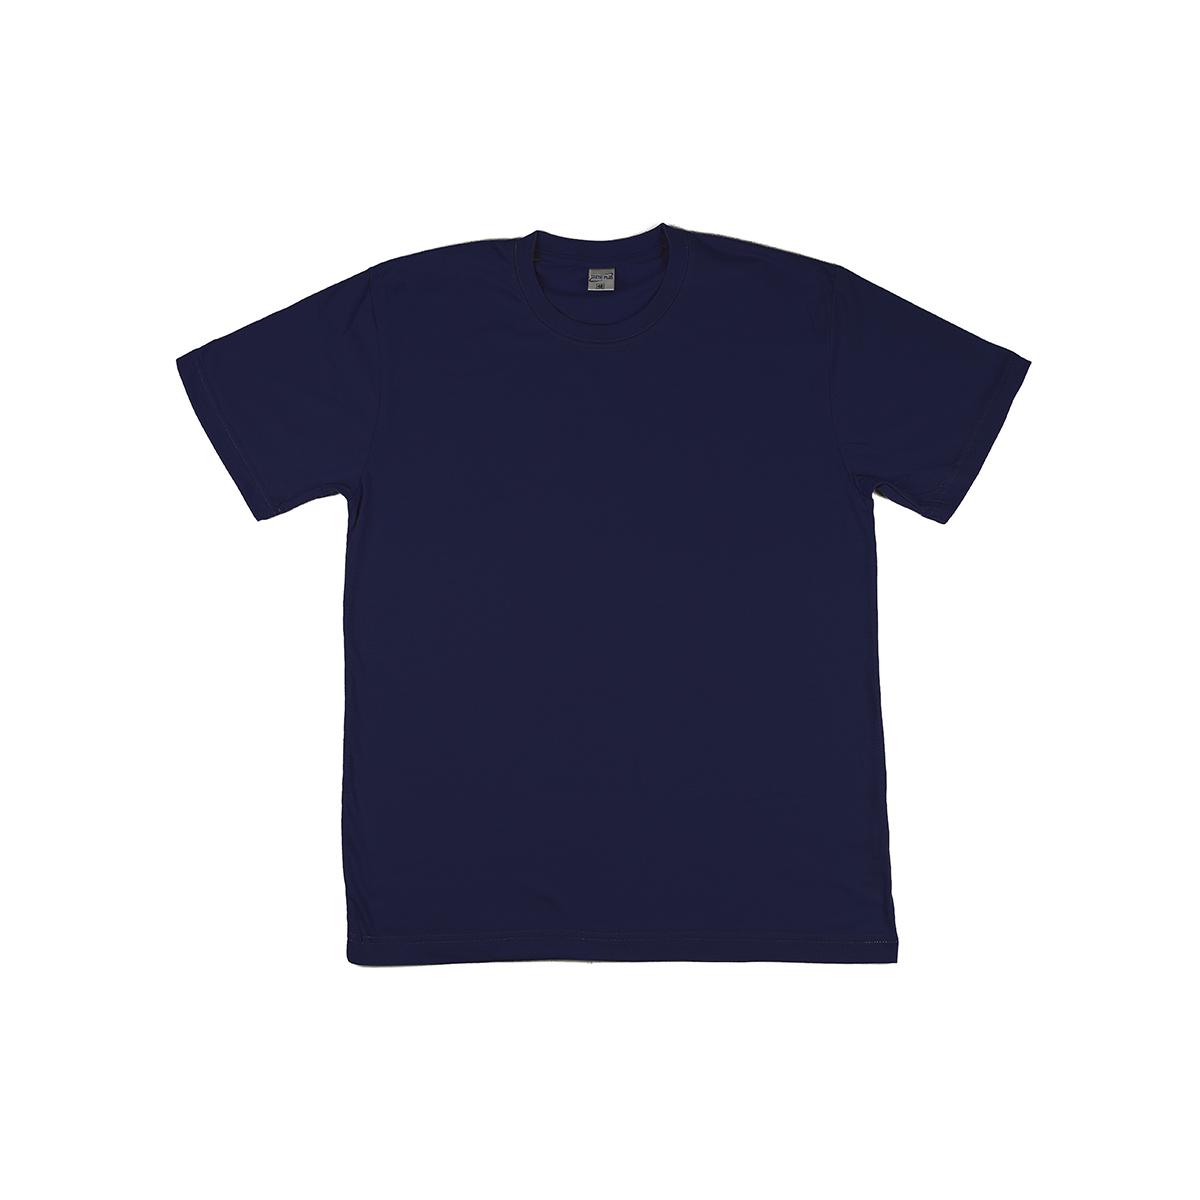 Мужская футболка Simple, цвет Зеленый, размер 52Футболки и майки<br><br><br>Тип: Муж. футболка<br>Размер: 52<br>Материал: Кулирка